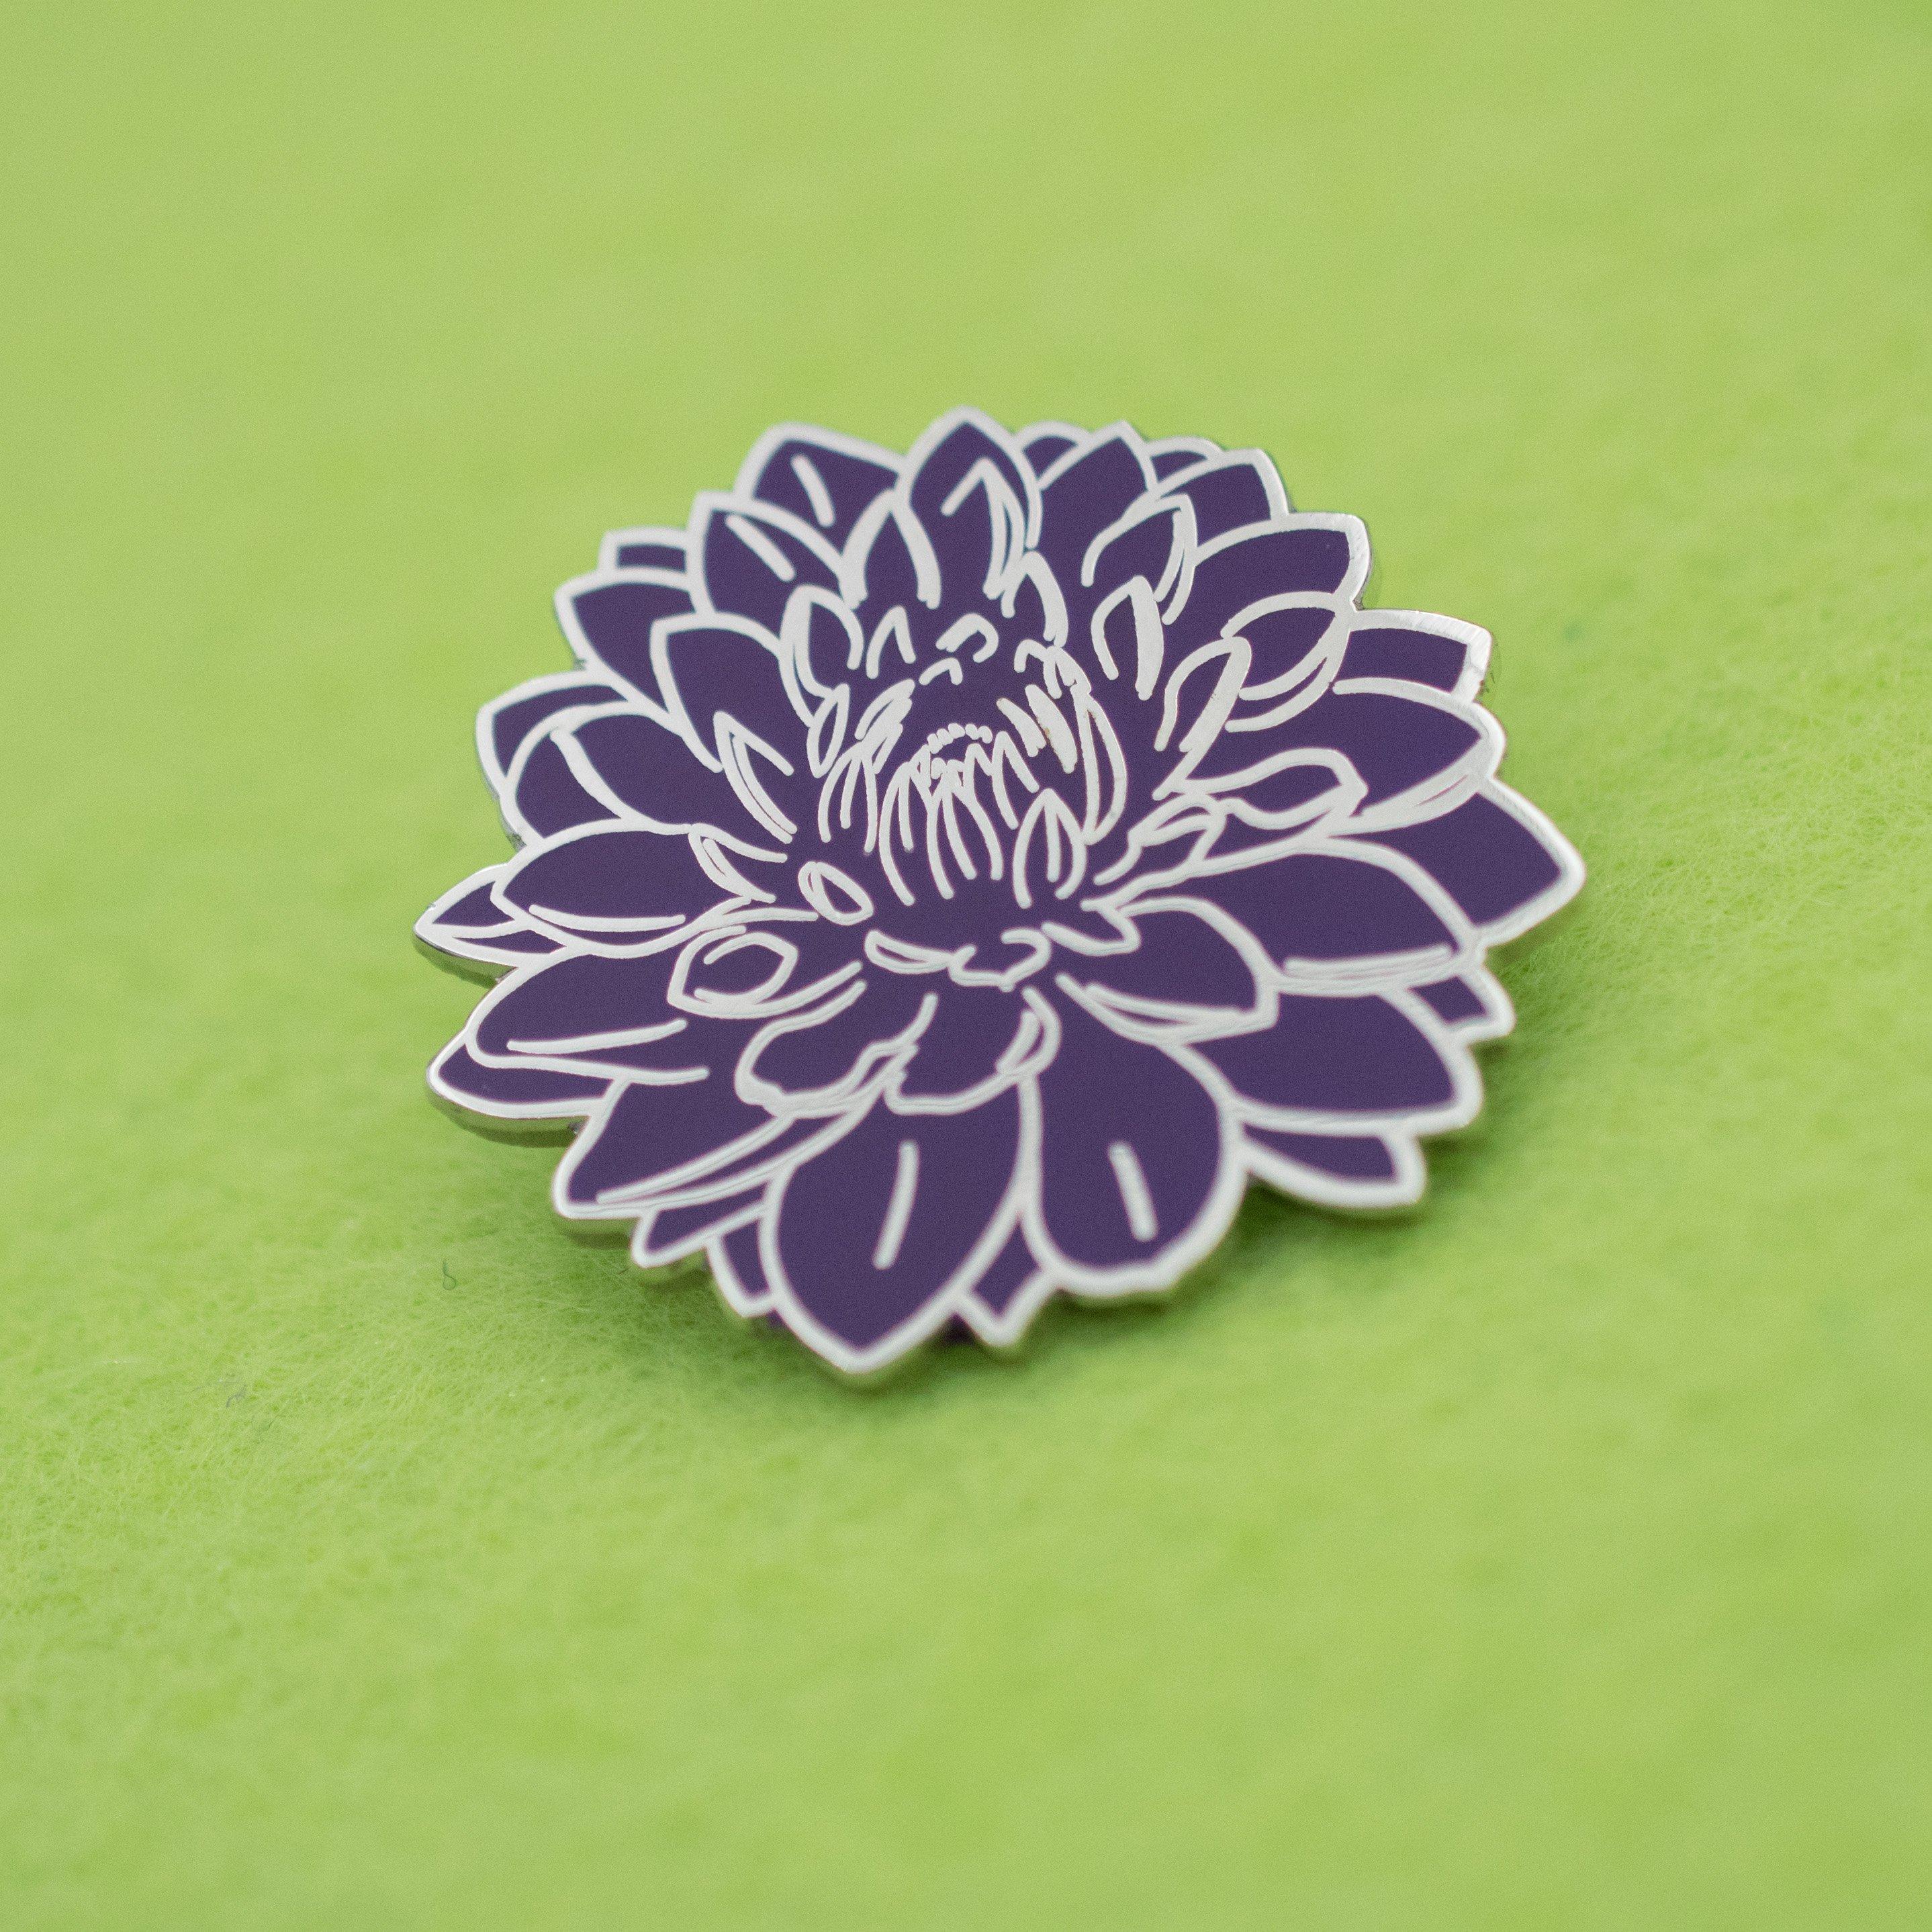 Dahlia Flower Hard Enamel Pin Pins Please Pinterest Dahlia